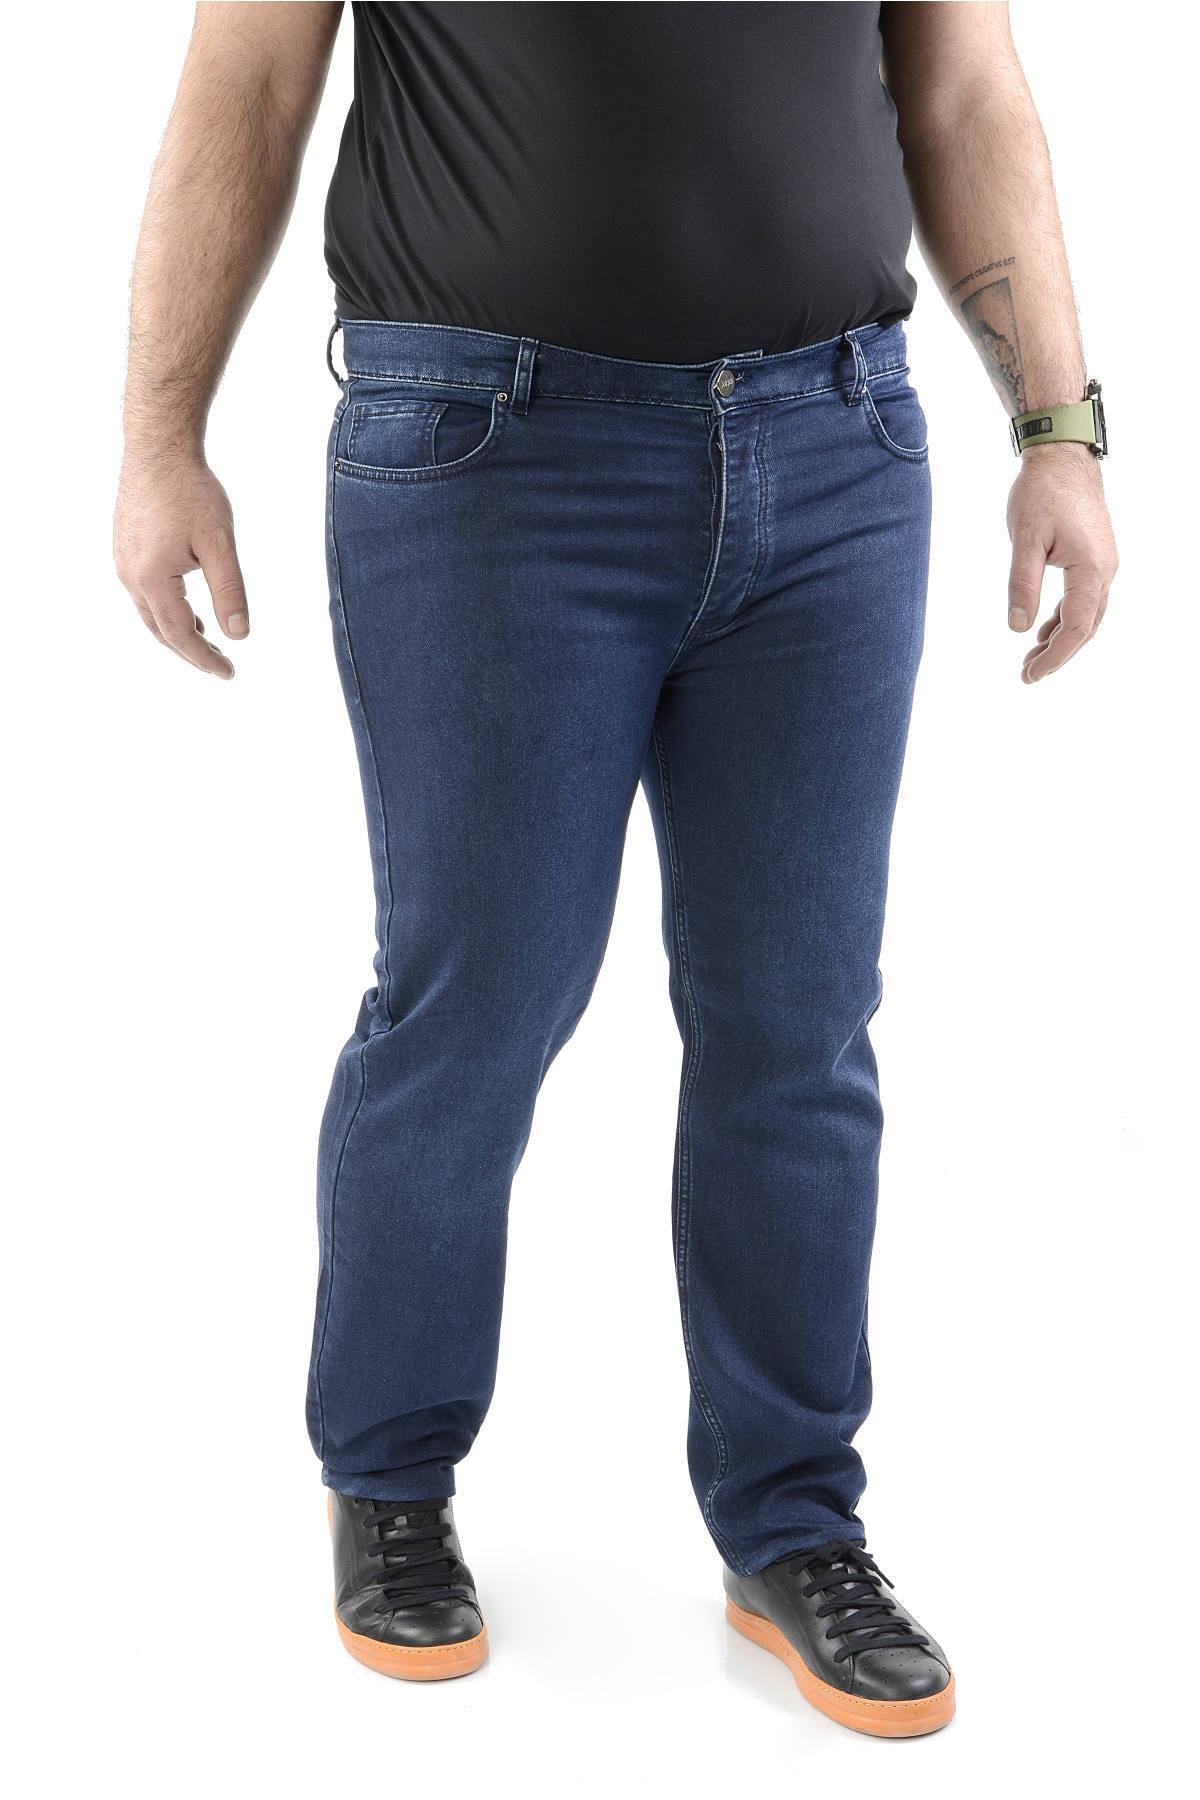 CEDY DENIM Mavi Erkek Kot Pantolon Battal Beden Slim Fit Jean - C4000 1